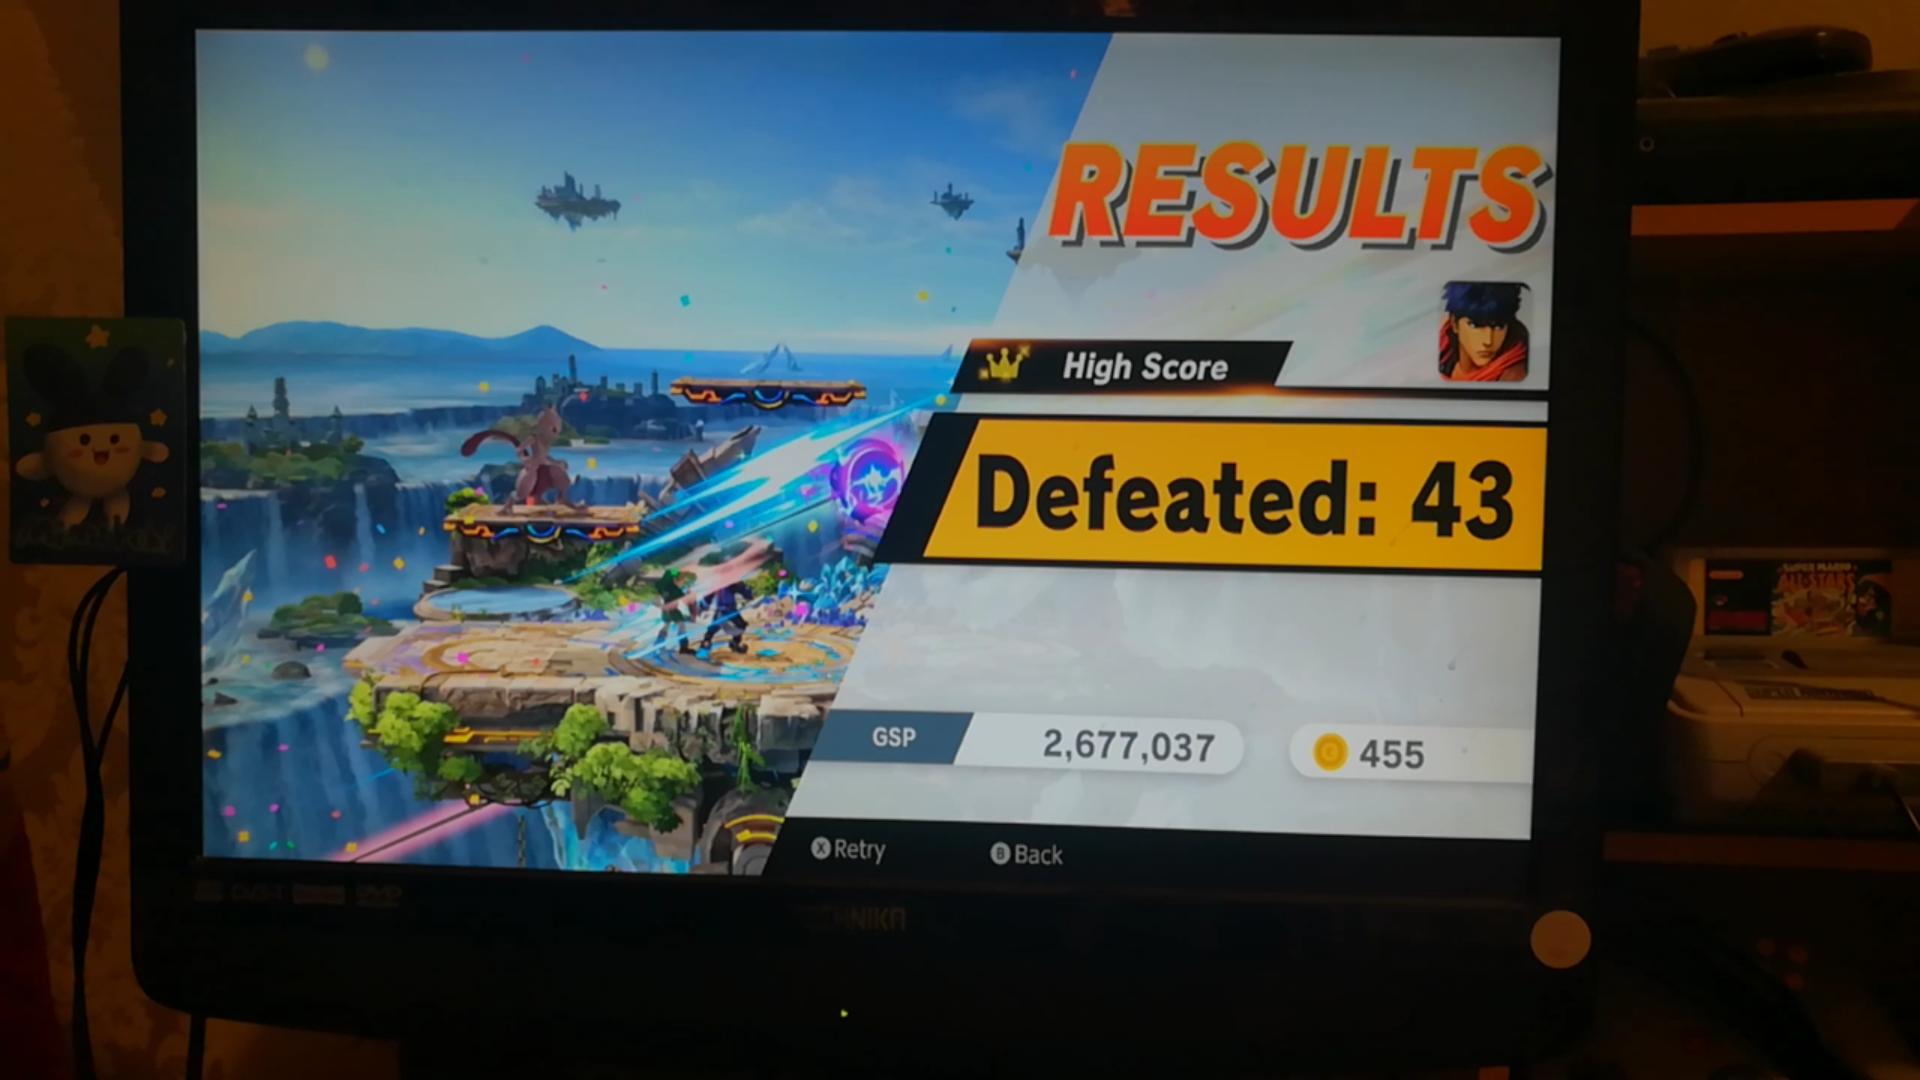 Mimitchi: Super Smash Bros. Ultimate: All-Star Smash: Ike (Nintendo Switch) 43 points on 2020-05-29 08:12:16